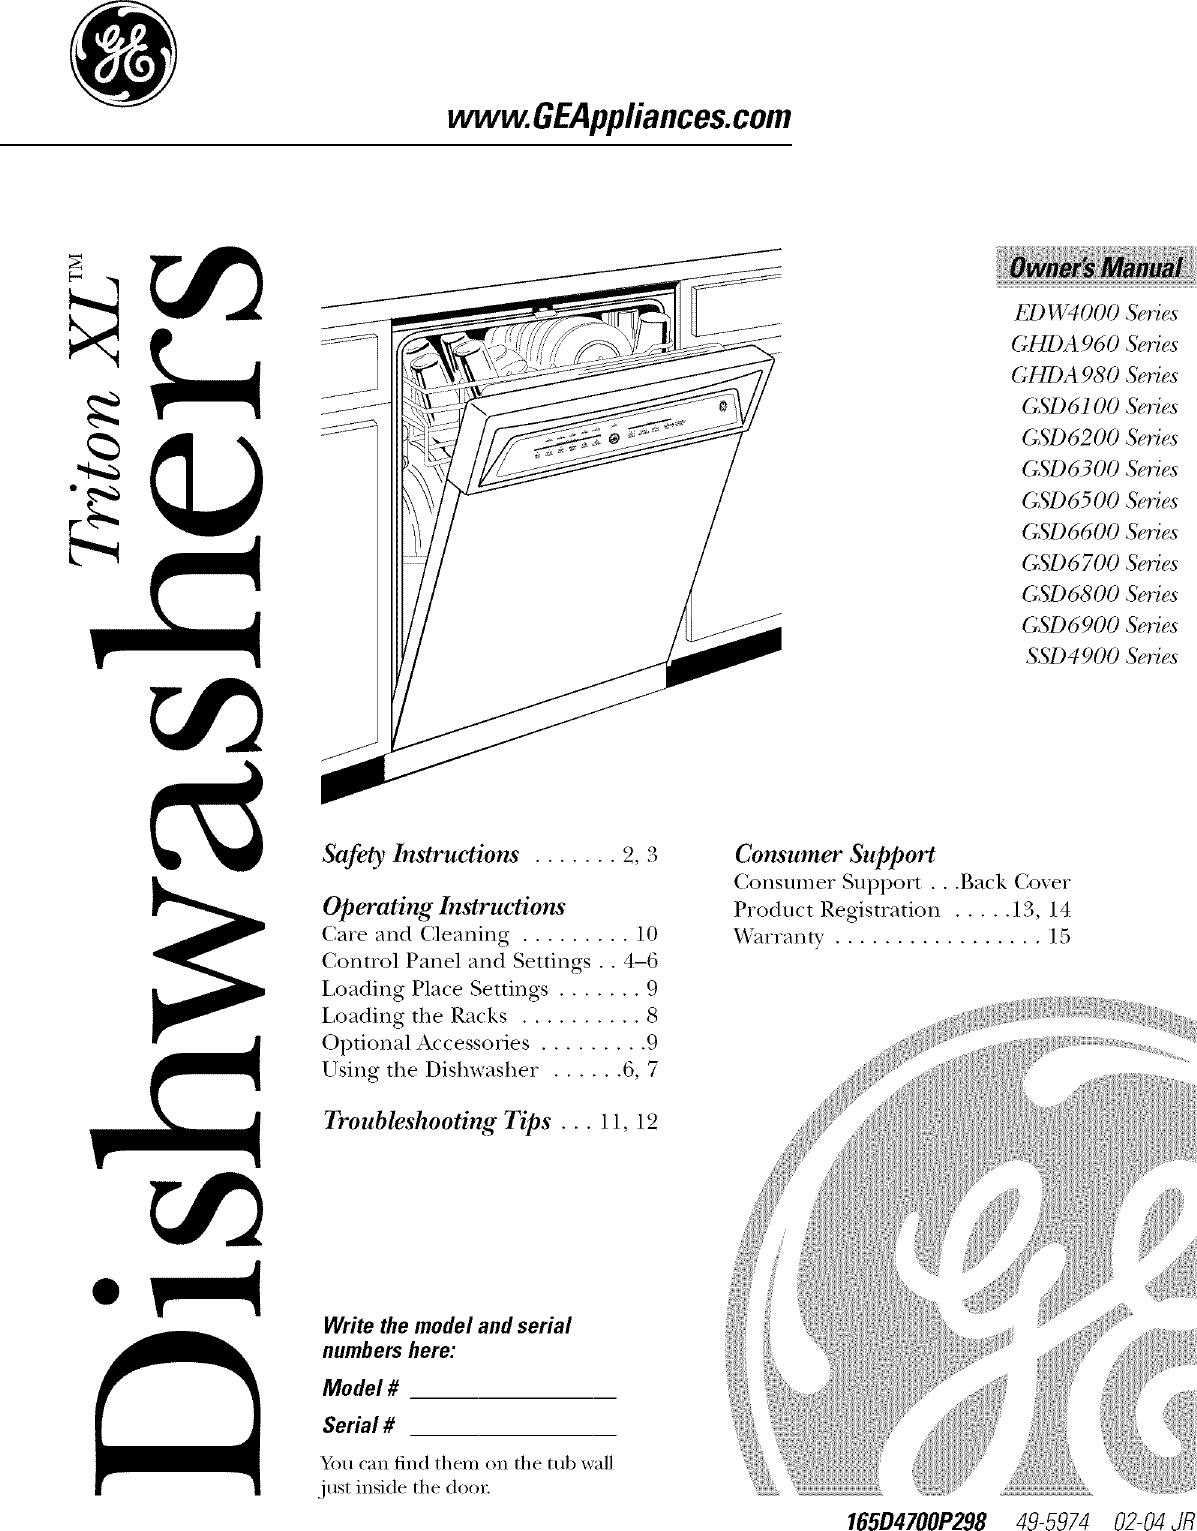 GE EDW4000G10BB User Manual DISHWASHER Manuals And Guides